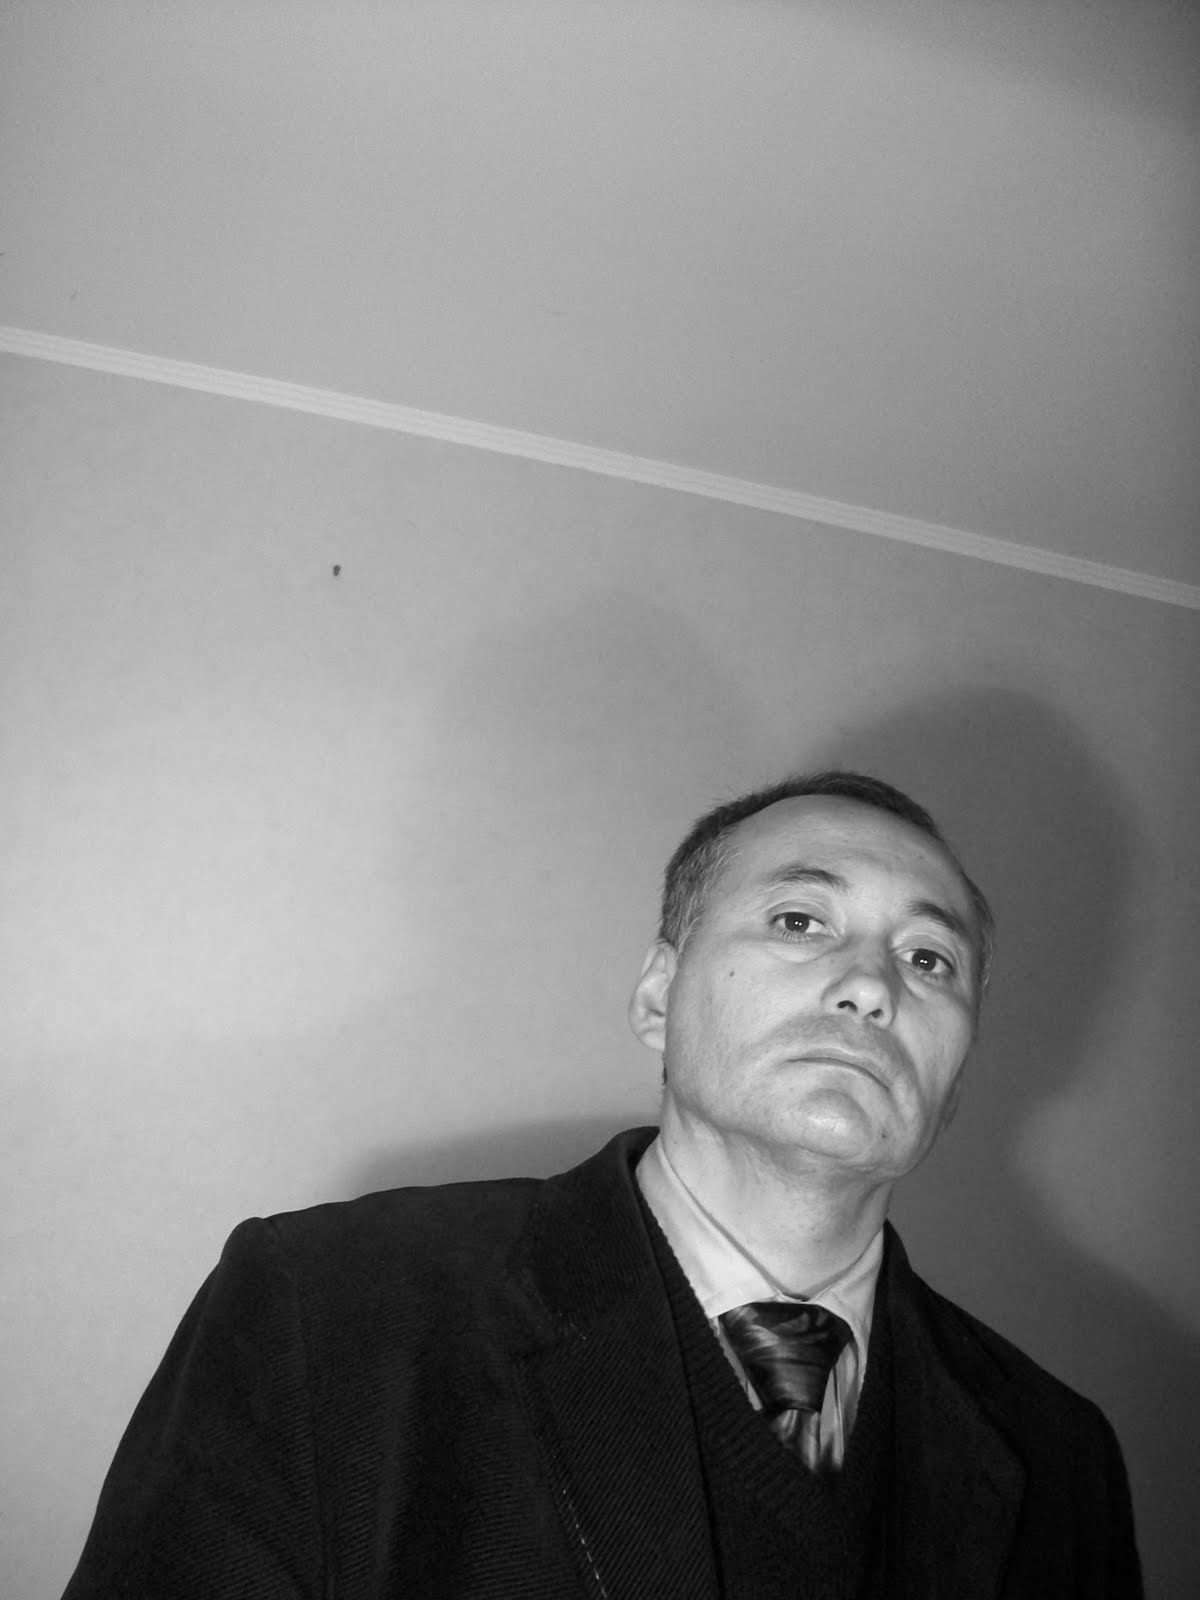 http://3.bp.blogspot.com/_MTMW0wRxmLE/TLAWhPxUp6I/AAAAAAAAA0c/PLGnowWfg80/s1600/Adolfo+Vasquez+Rocca+Portrait+_+Pau+2010+101_1792.JPG